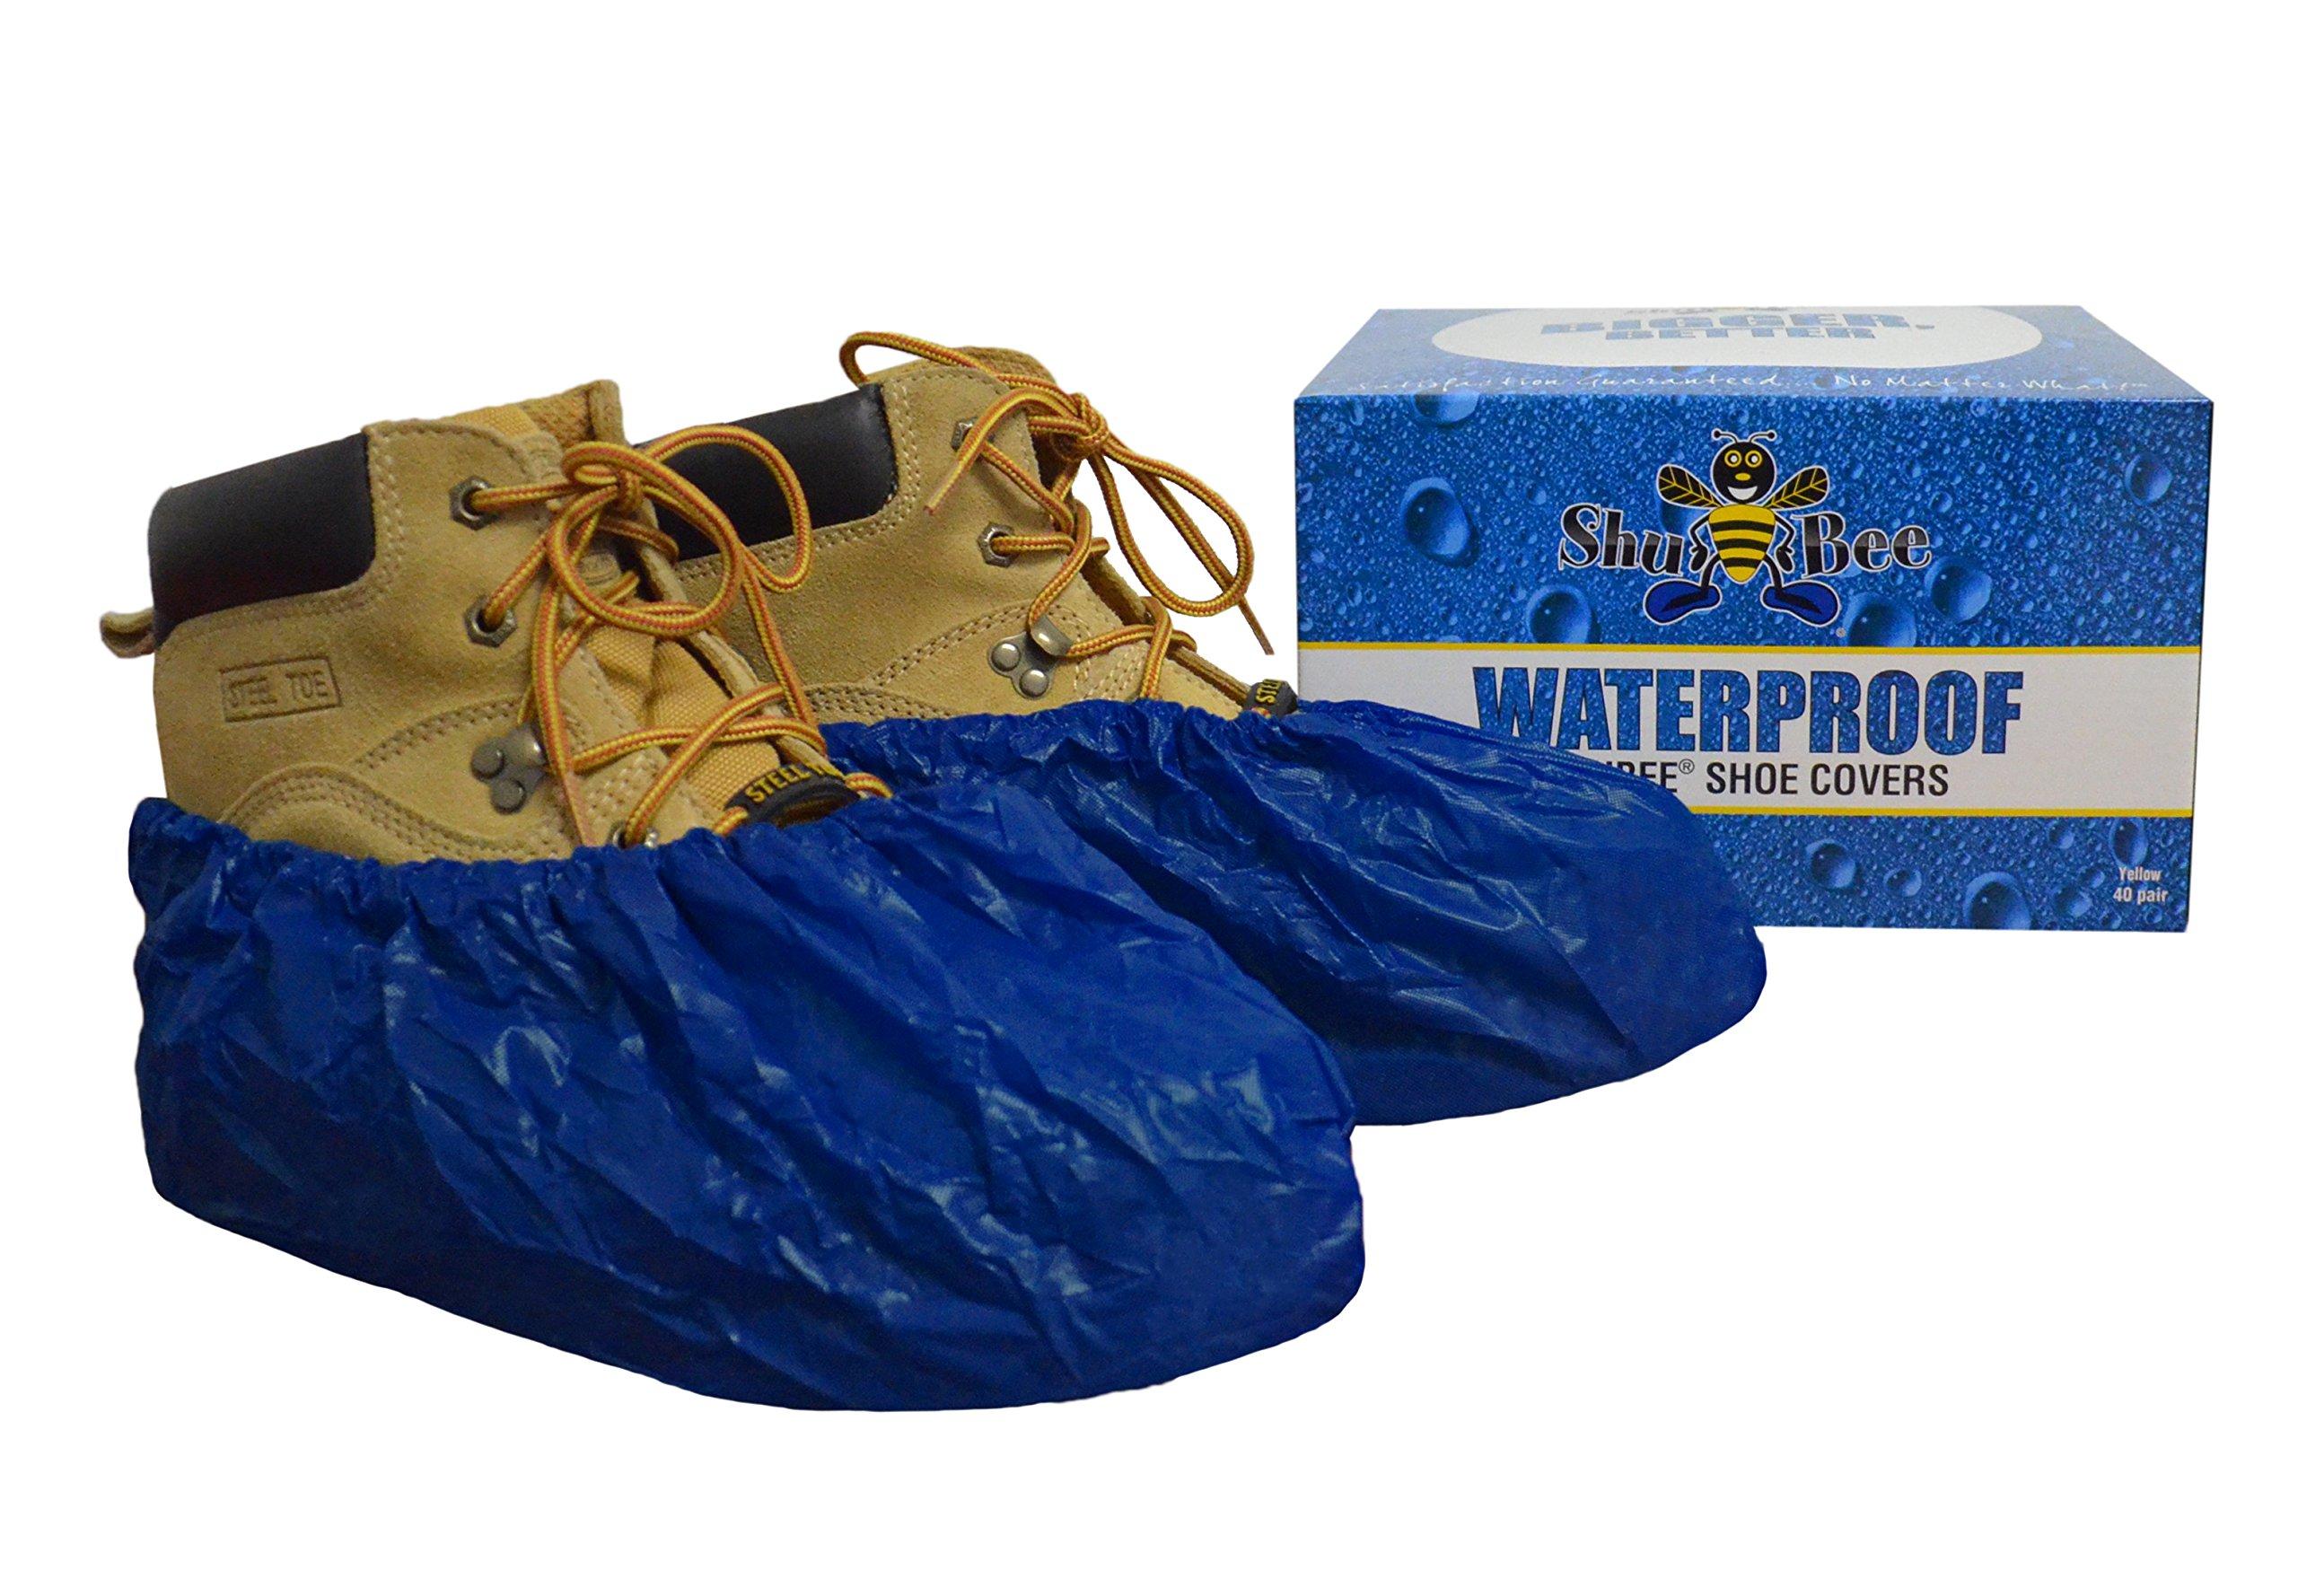 ShuBee Waterproof Shoe Covers, Dark Blue, Dispenser Box